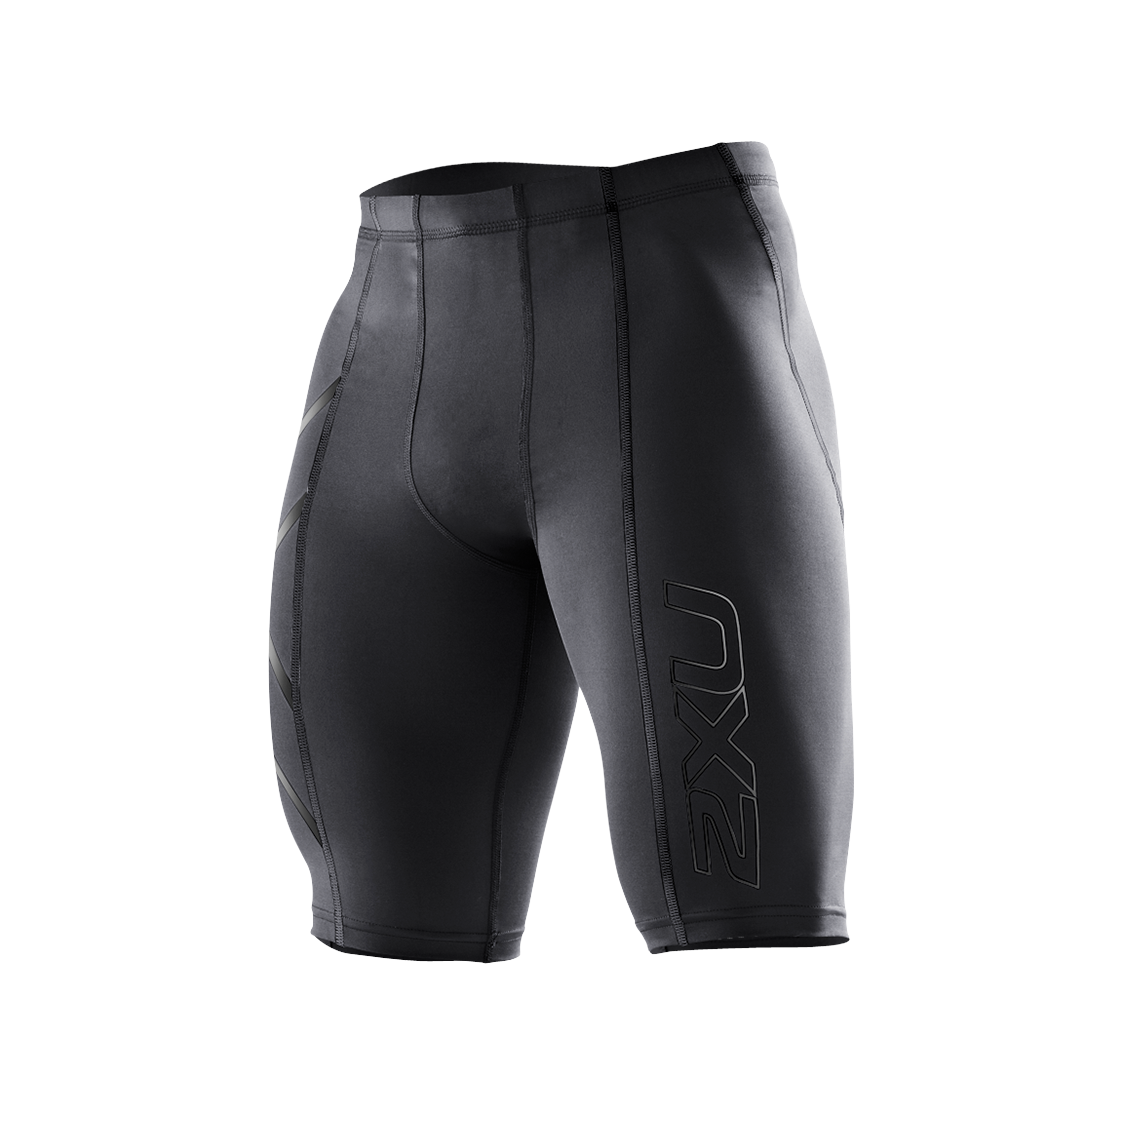 2XU Men Compression Shorts Tight Running Sweat Pants Short Fitness Brand Board